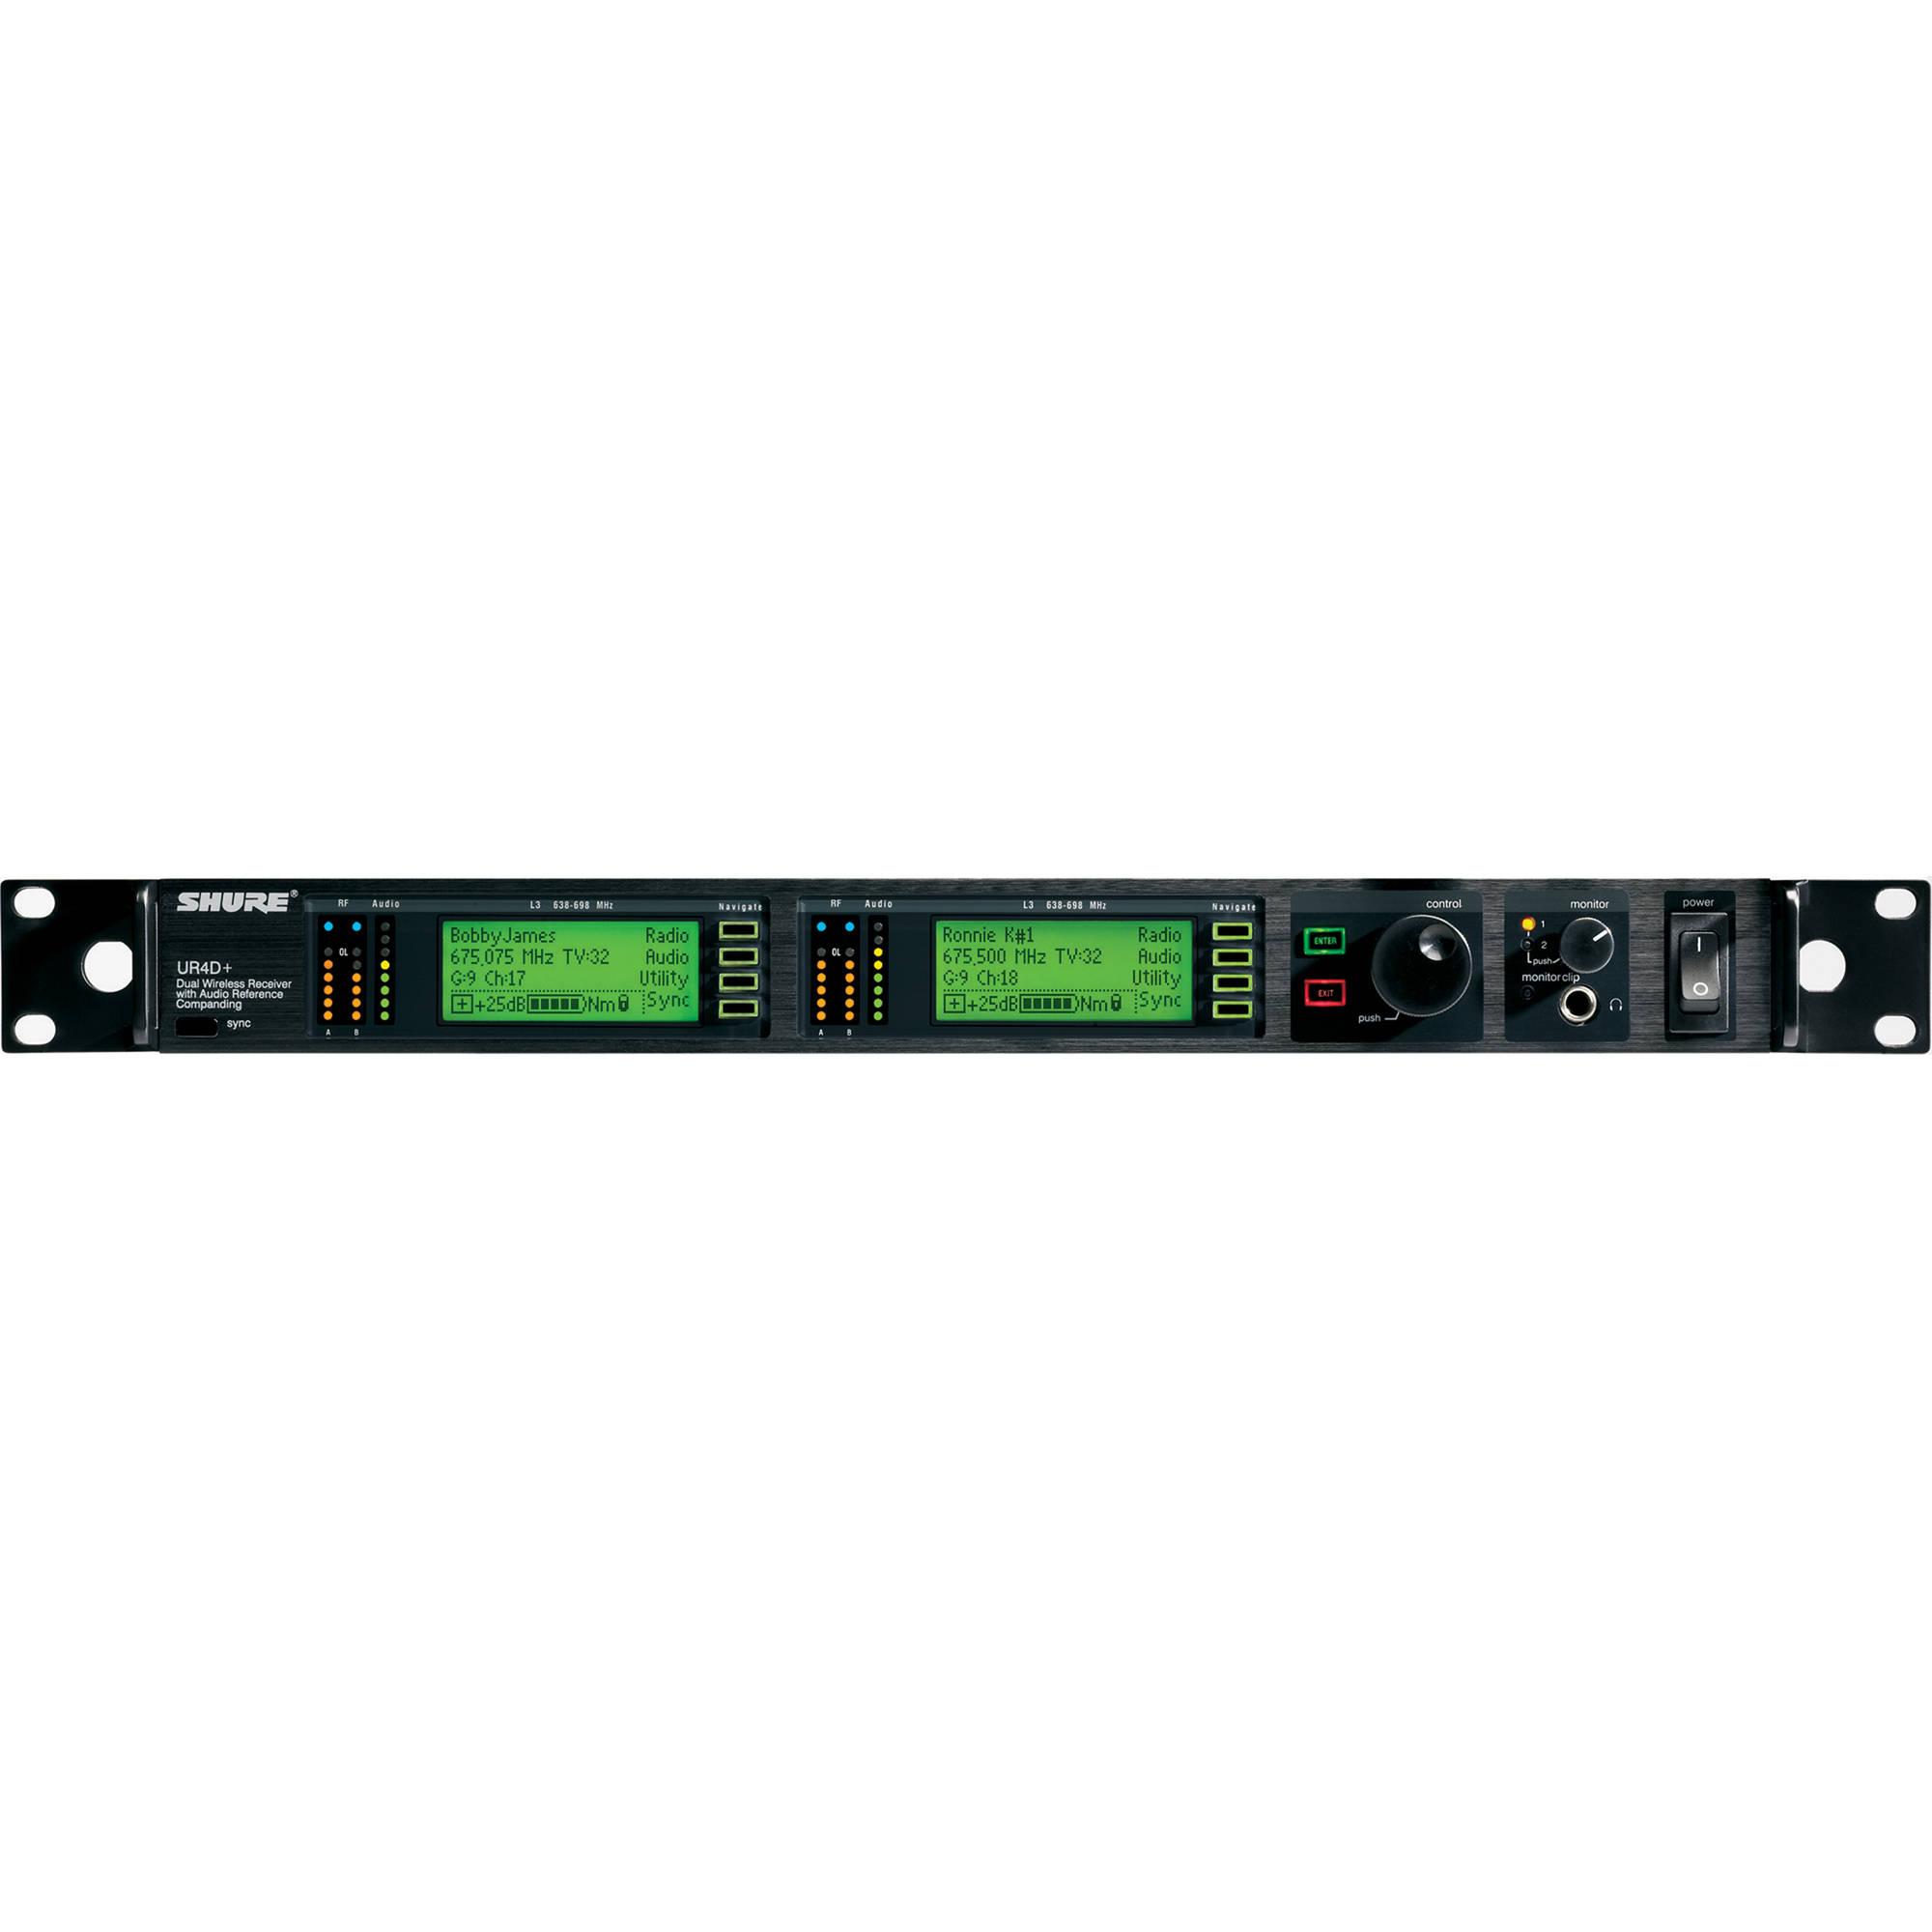 Shure Ur4d Dual Diversity Uhf Wireless Microphone H4 Bh Receiver Circuit